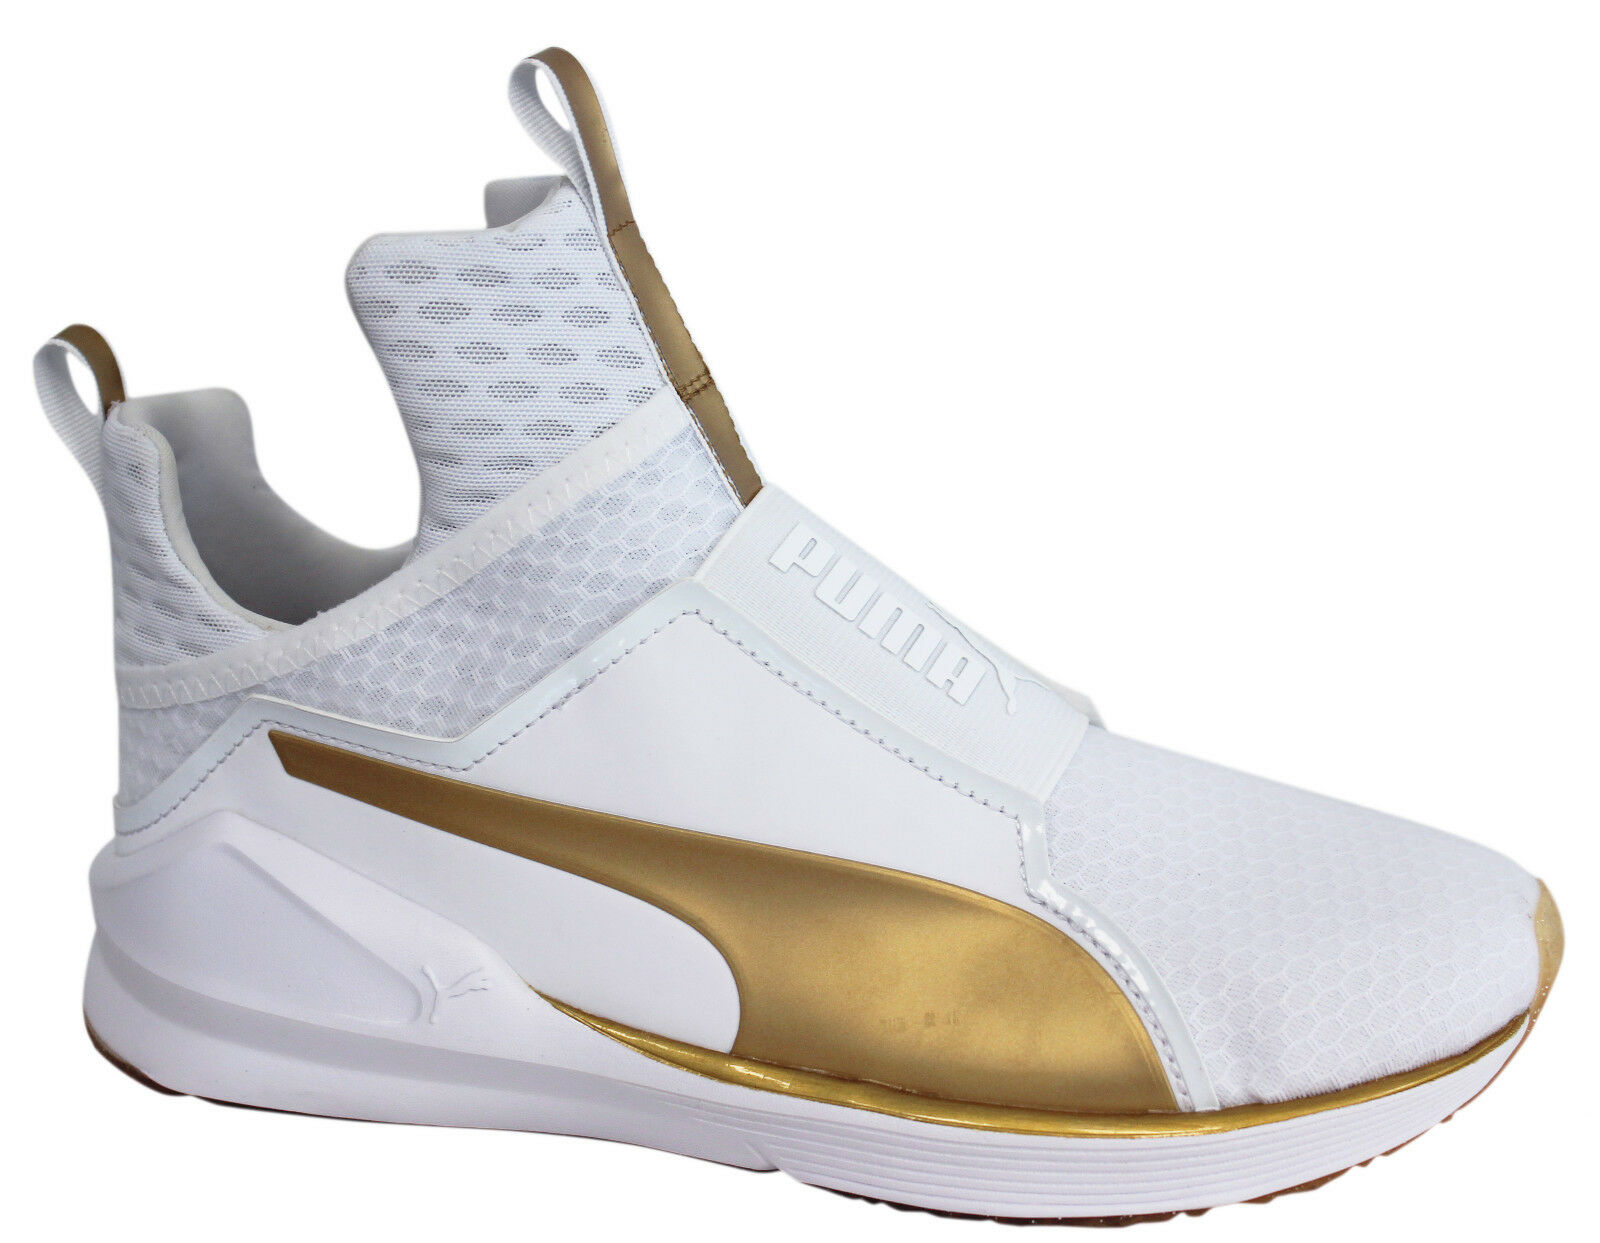 Puma Fierce Dance Training Chaussures Wo Hommes Slip On Trainers blanc  189192 01 P5